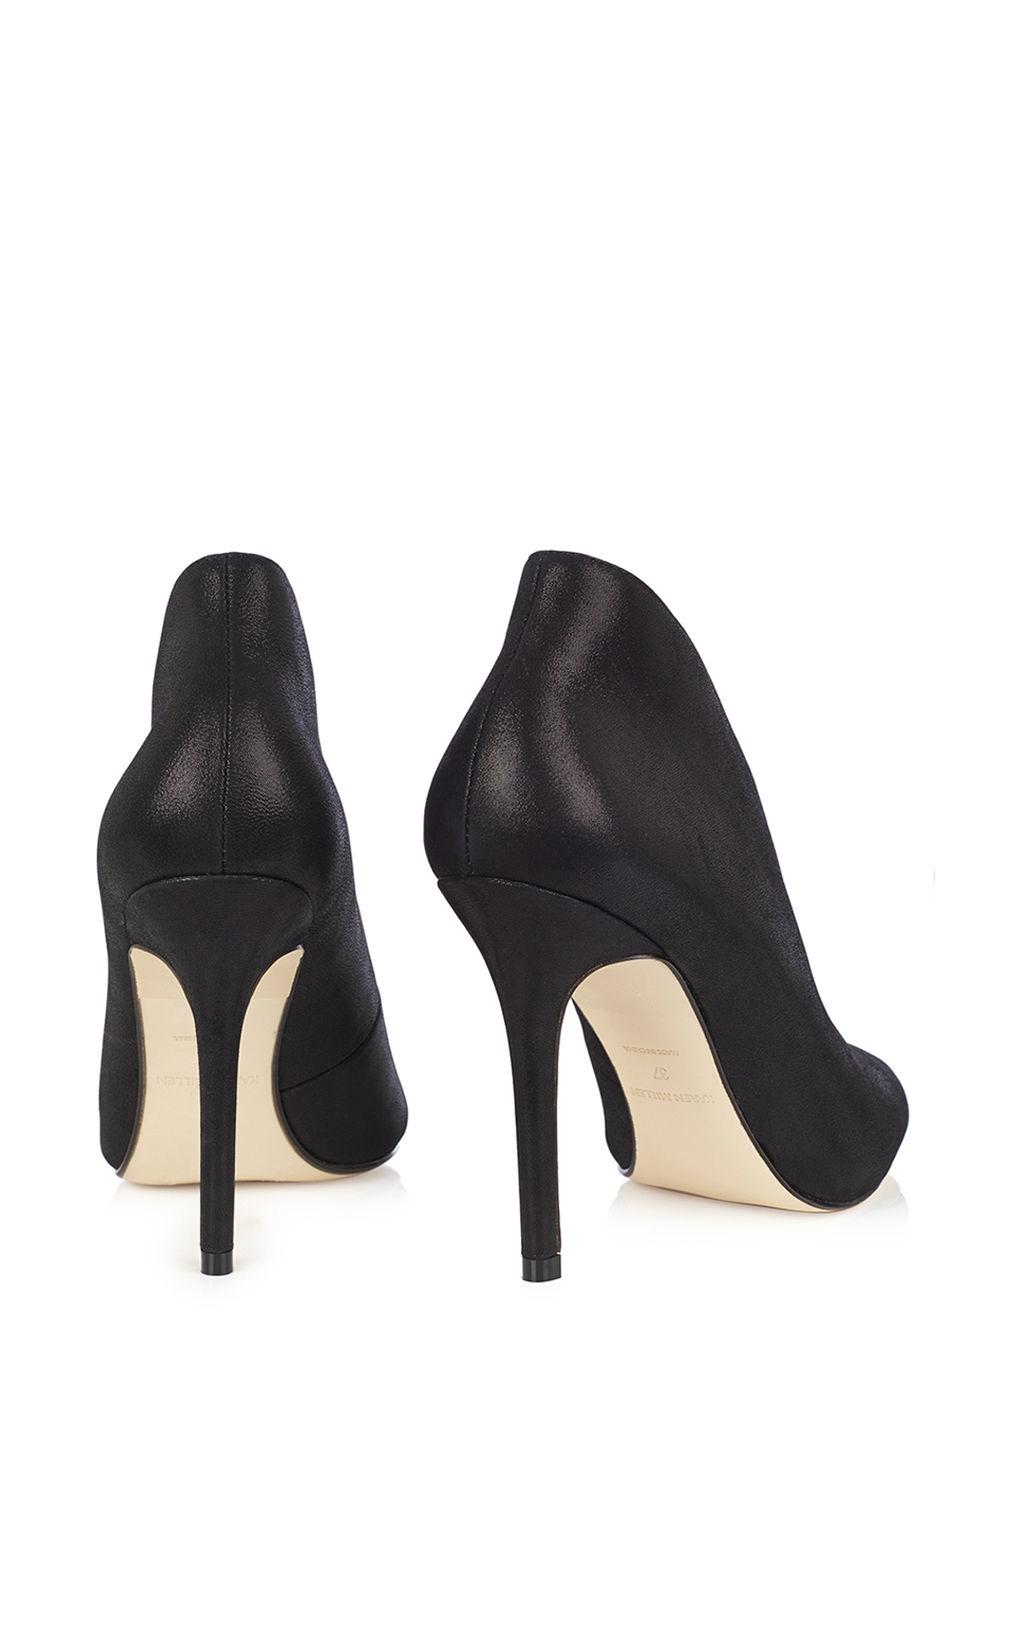 Karen Millen Leather Pearlised Shoe Boot - Black